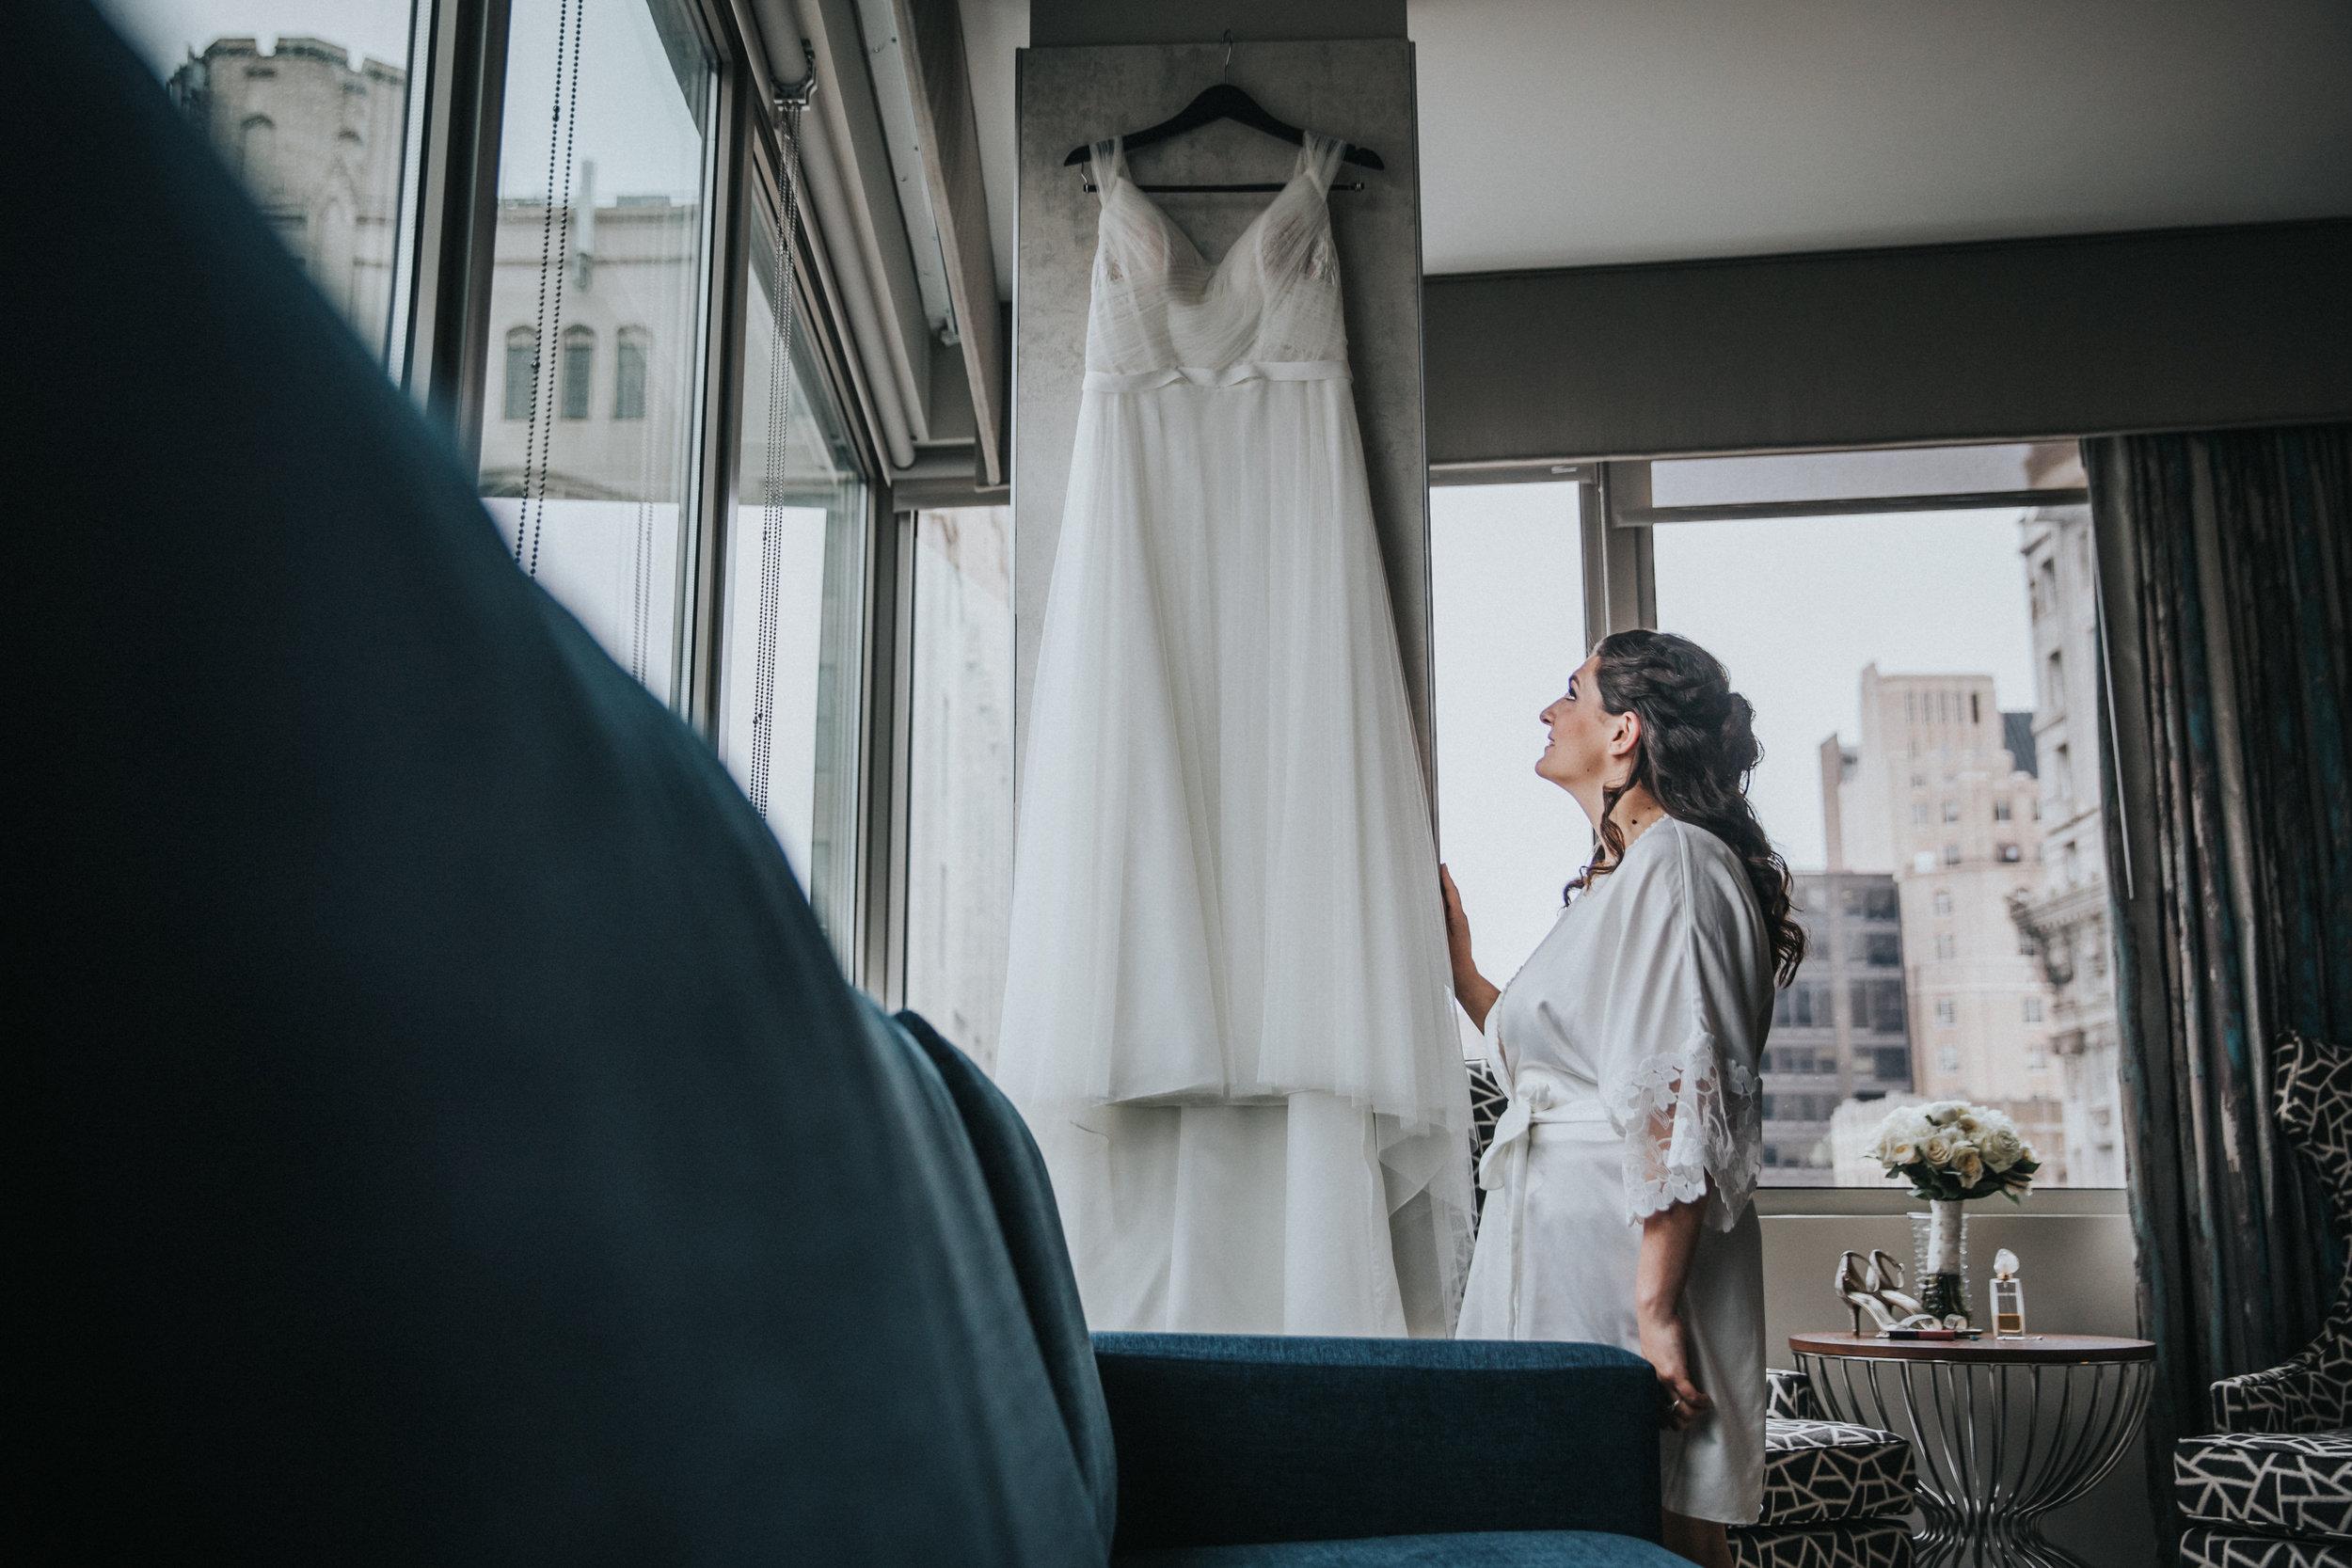 JennaLynnPhotography-NJWeddingPhotographer-Philadelphia-Wedding-ArtsBallroom-GettingReady-30.jpg